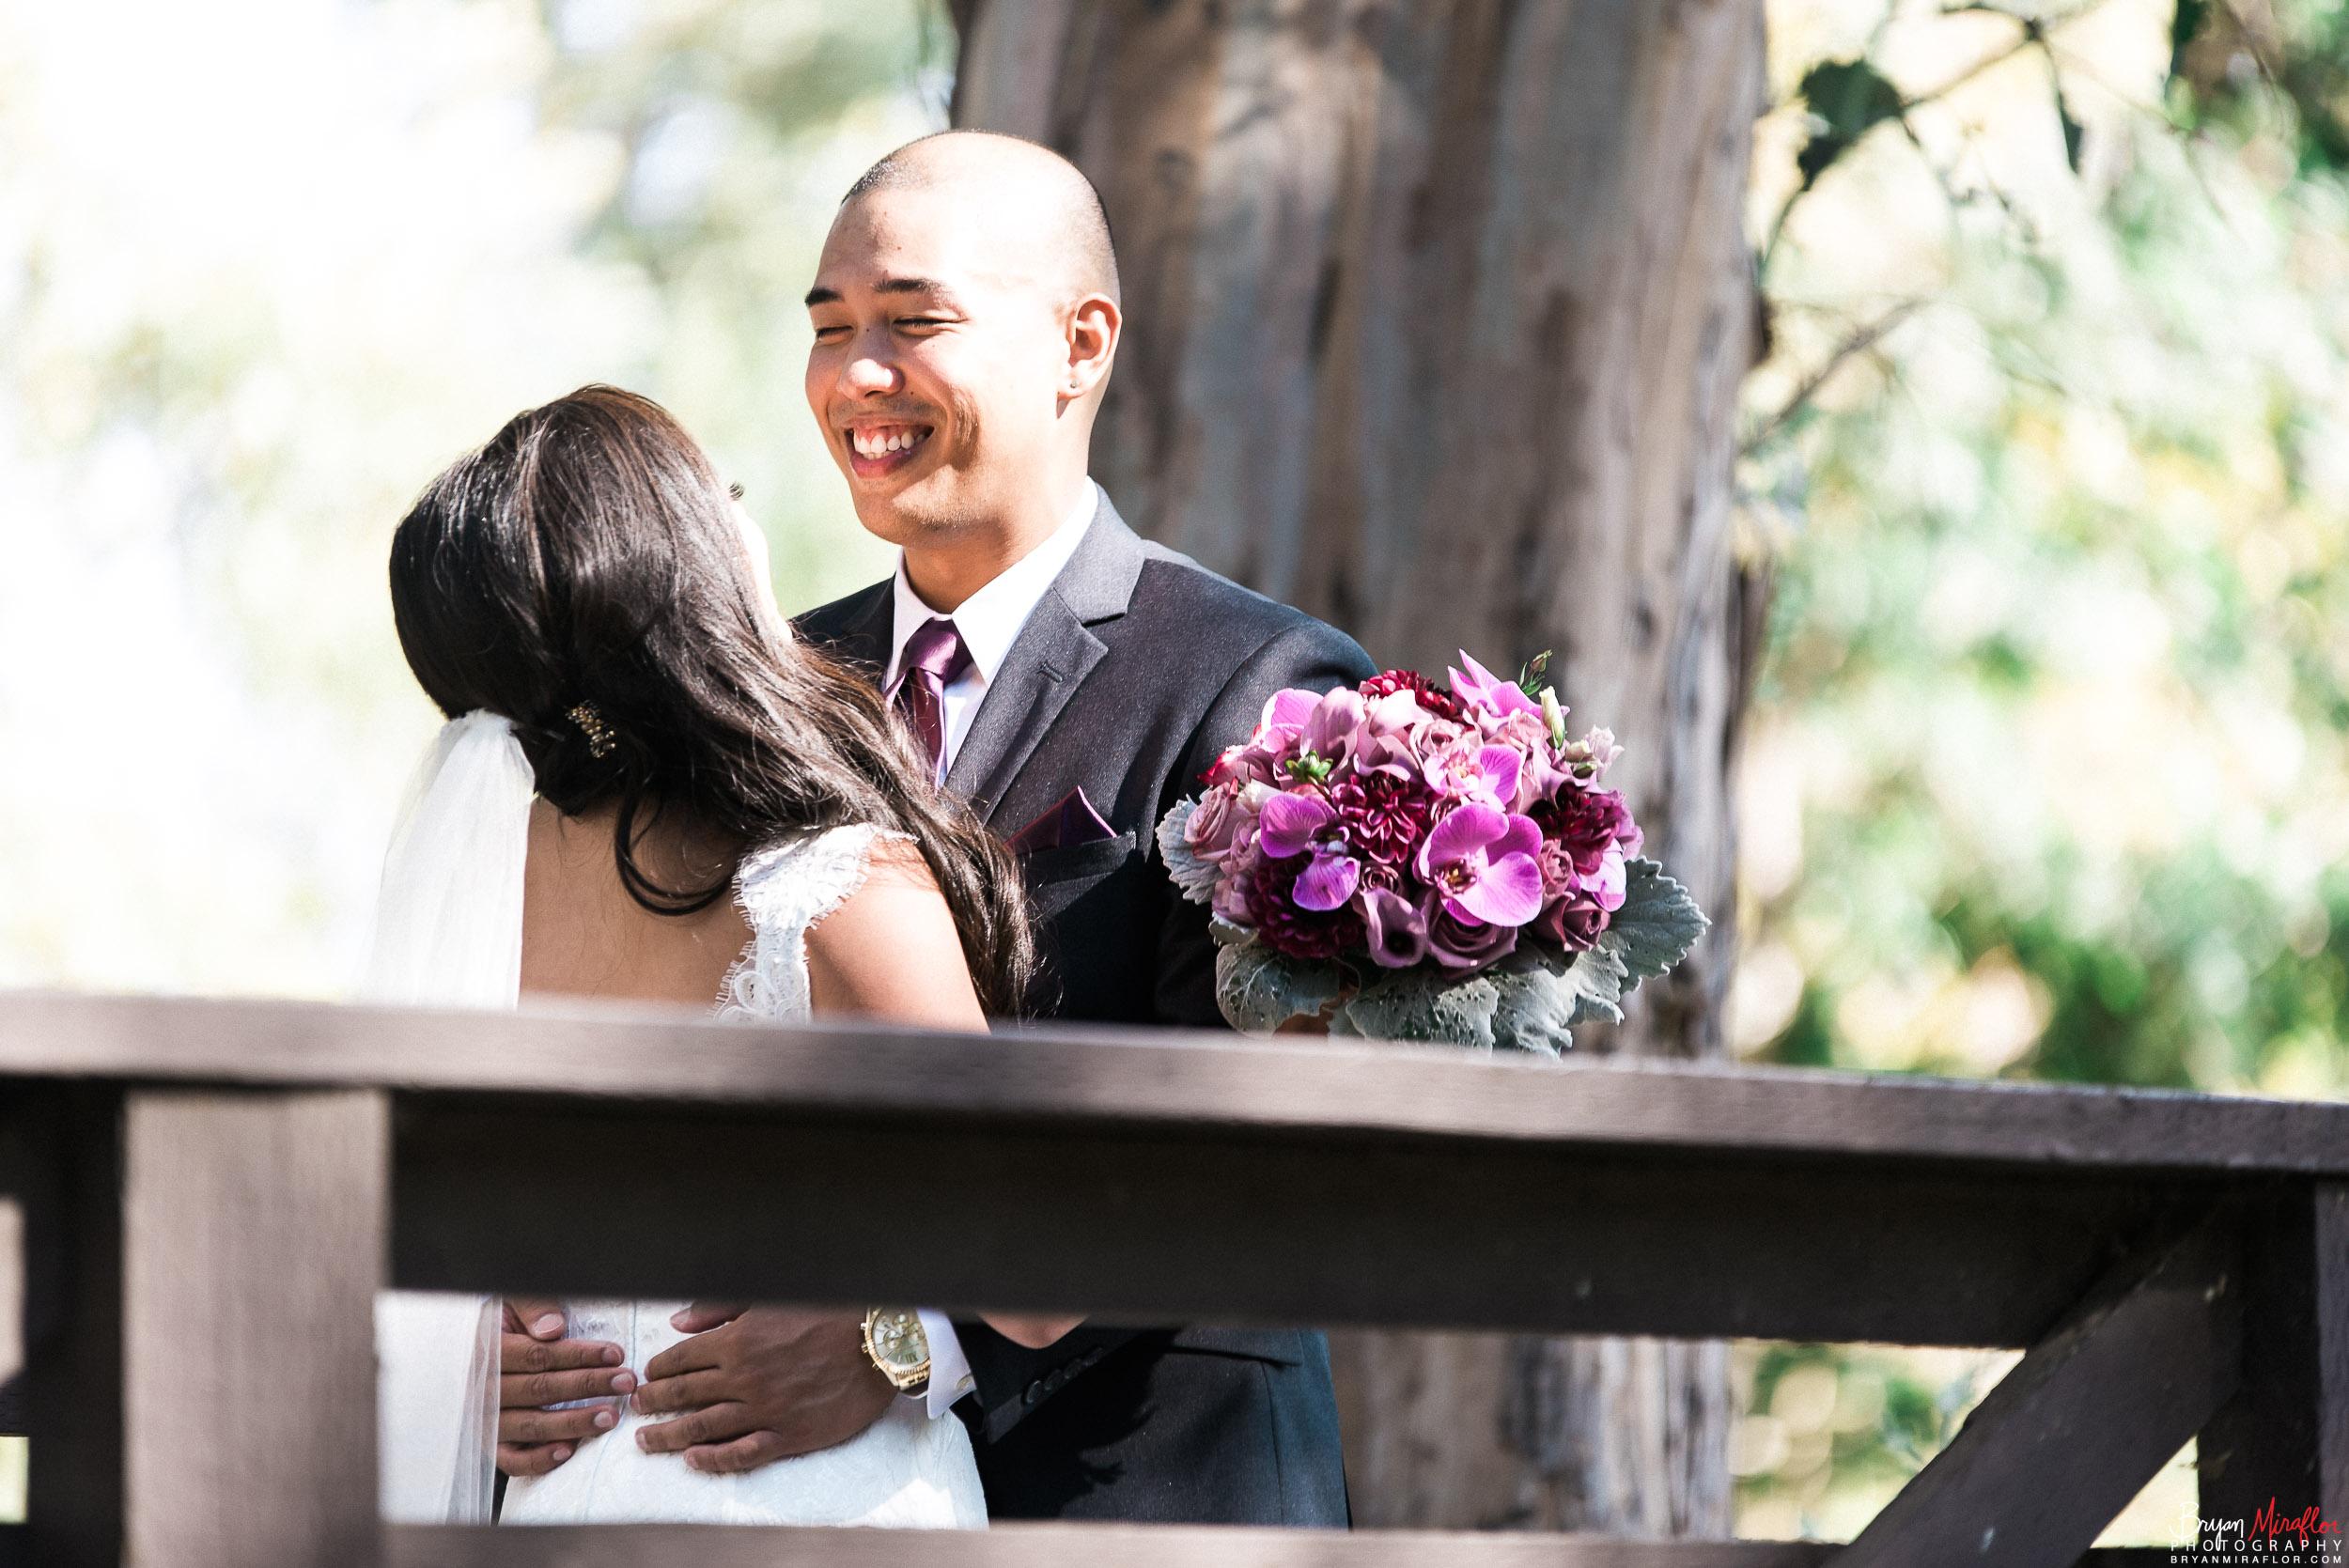 Bryan-Miraflor-Photography-Trisha-Dexter-Married-20170923-021.jpg